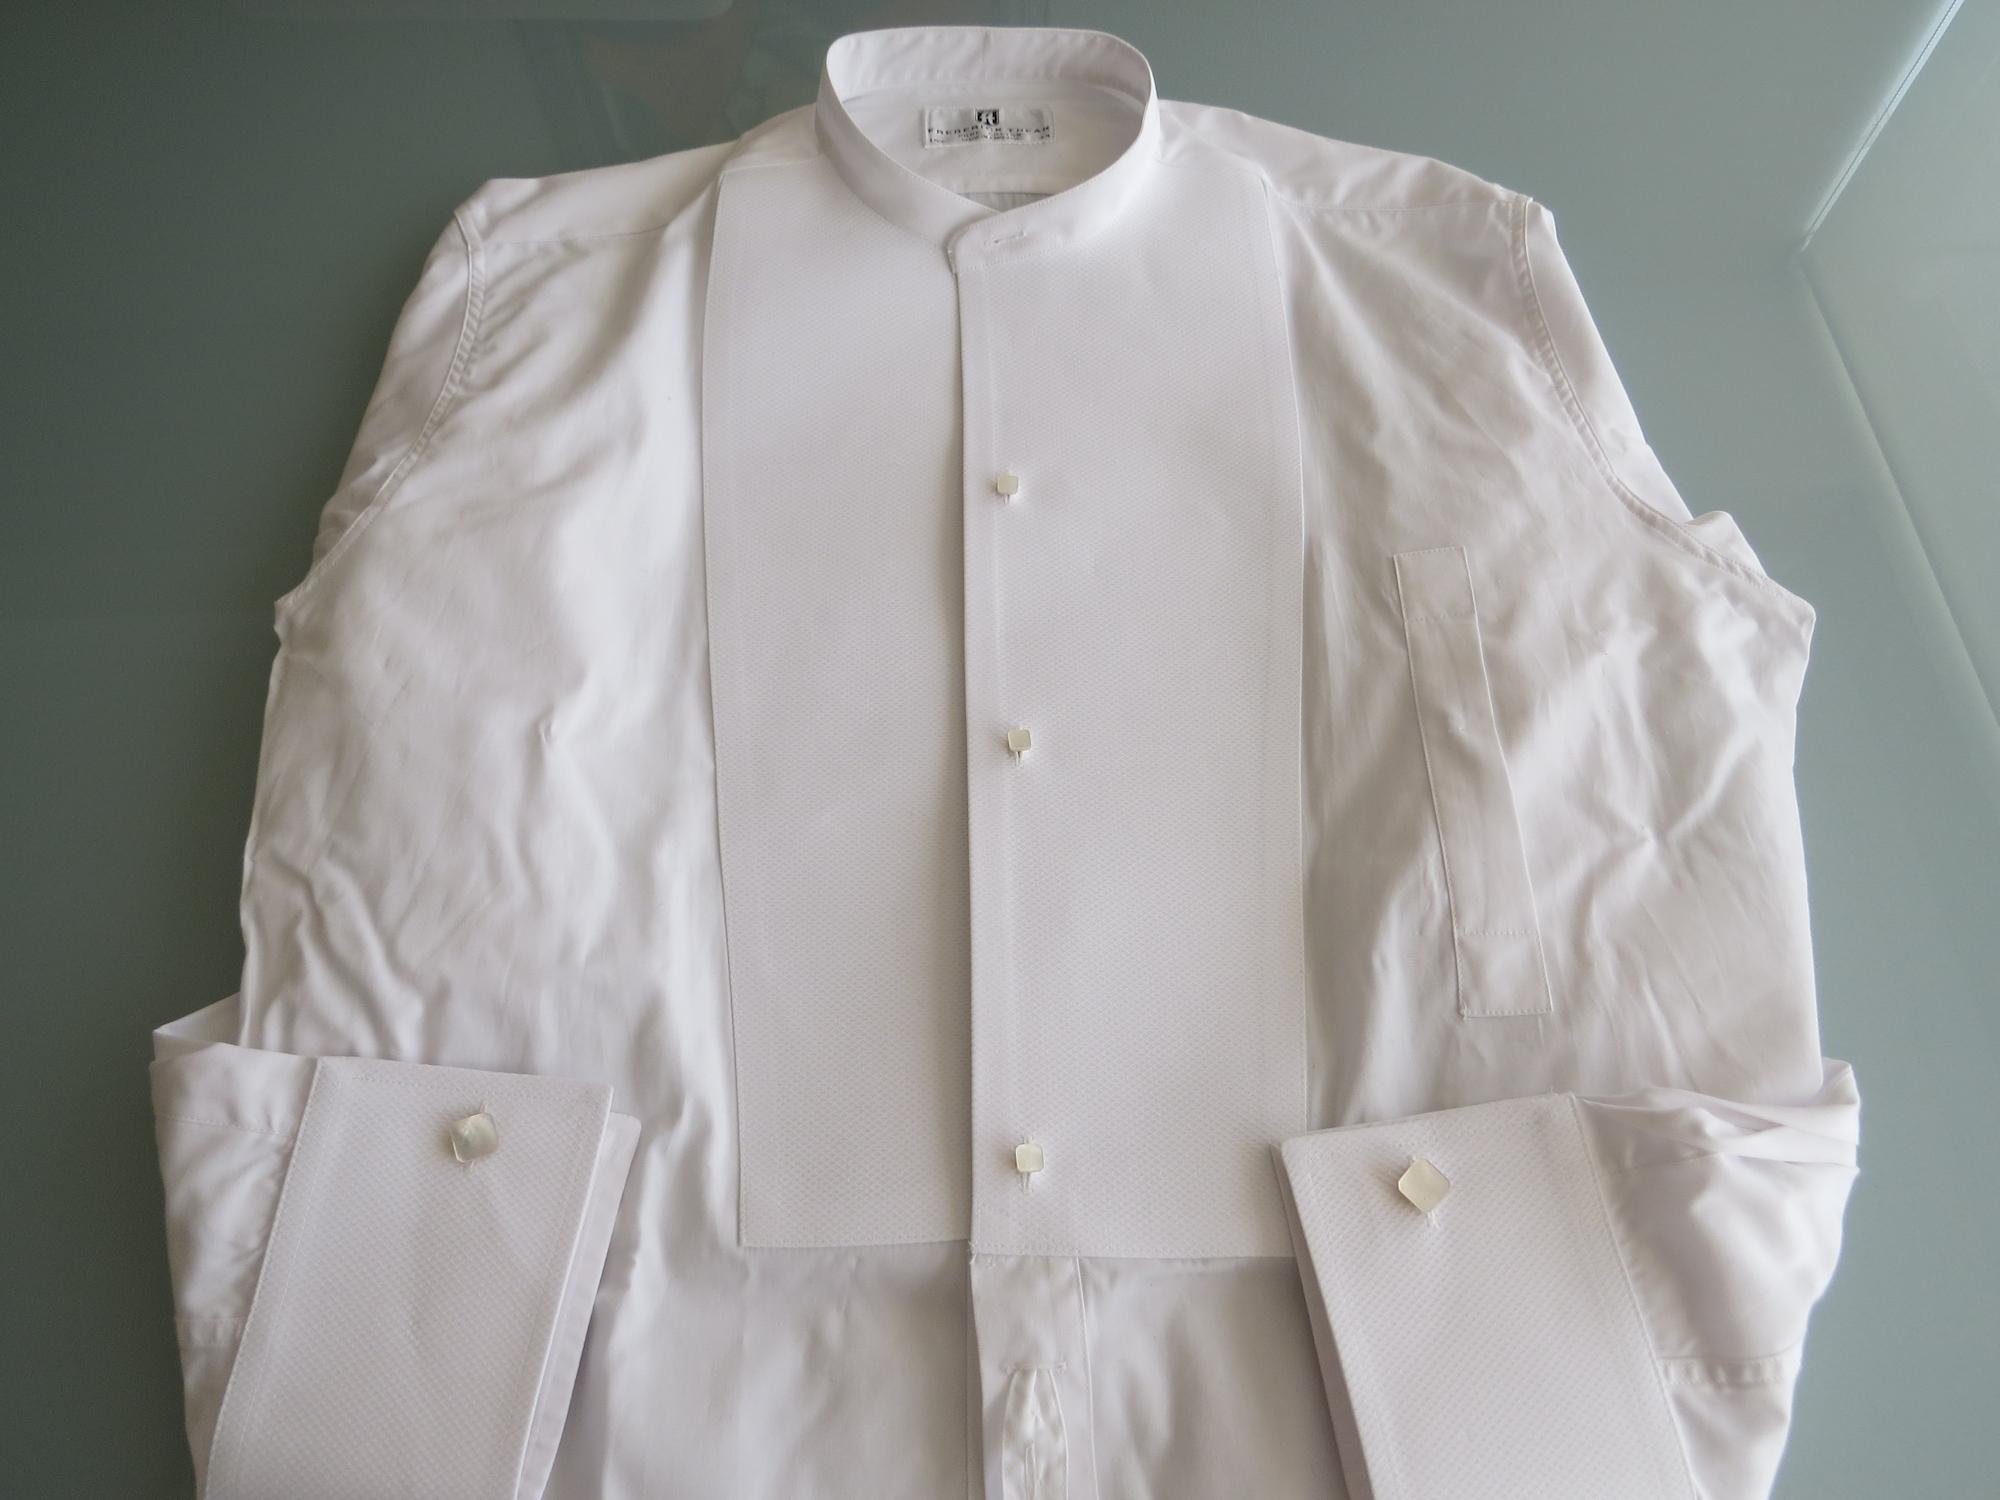 Closeout Sale At Torontos Walter Beauchamp Tailors Black Tie Blog